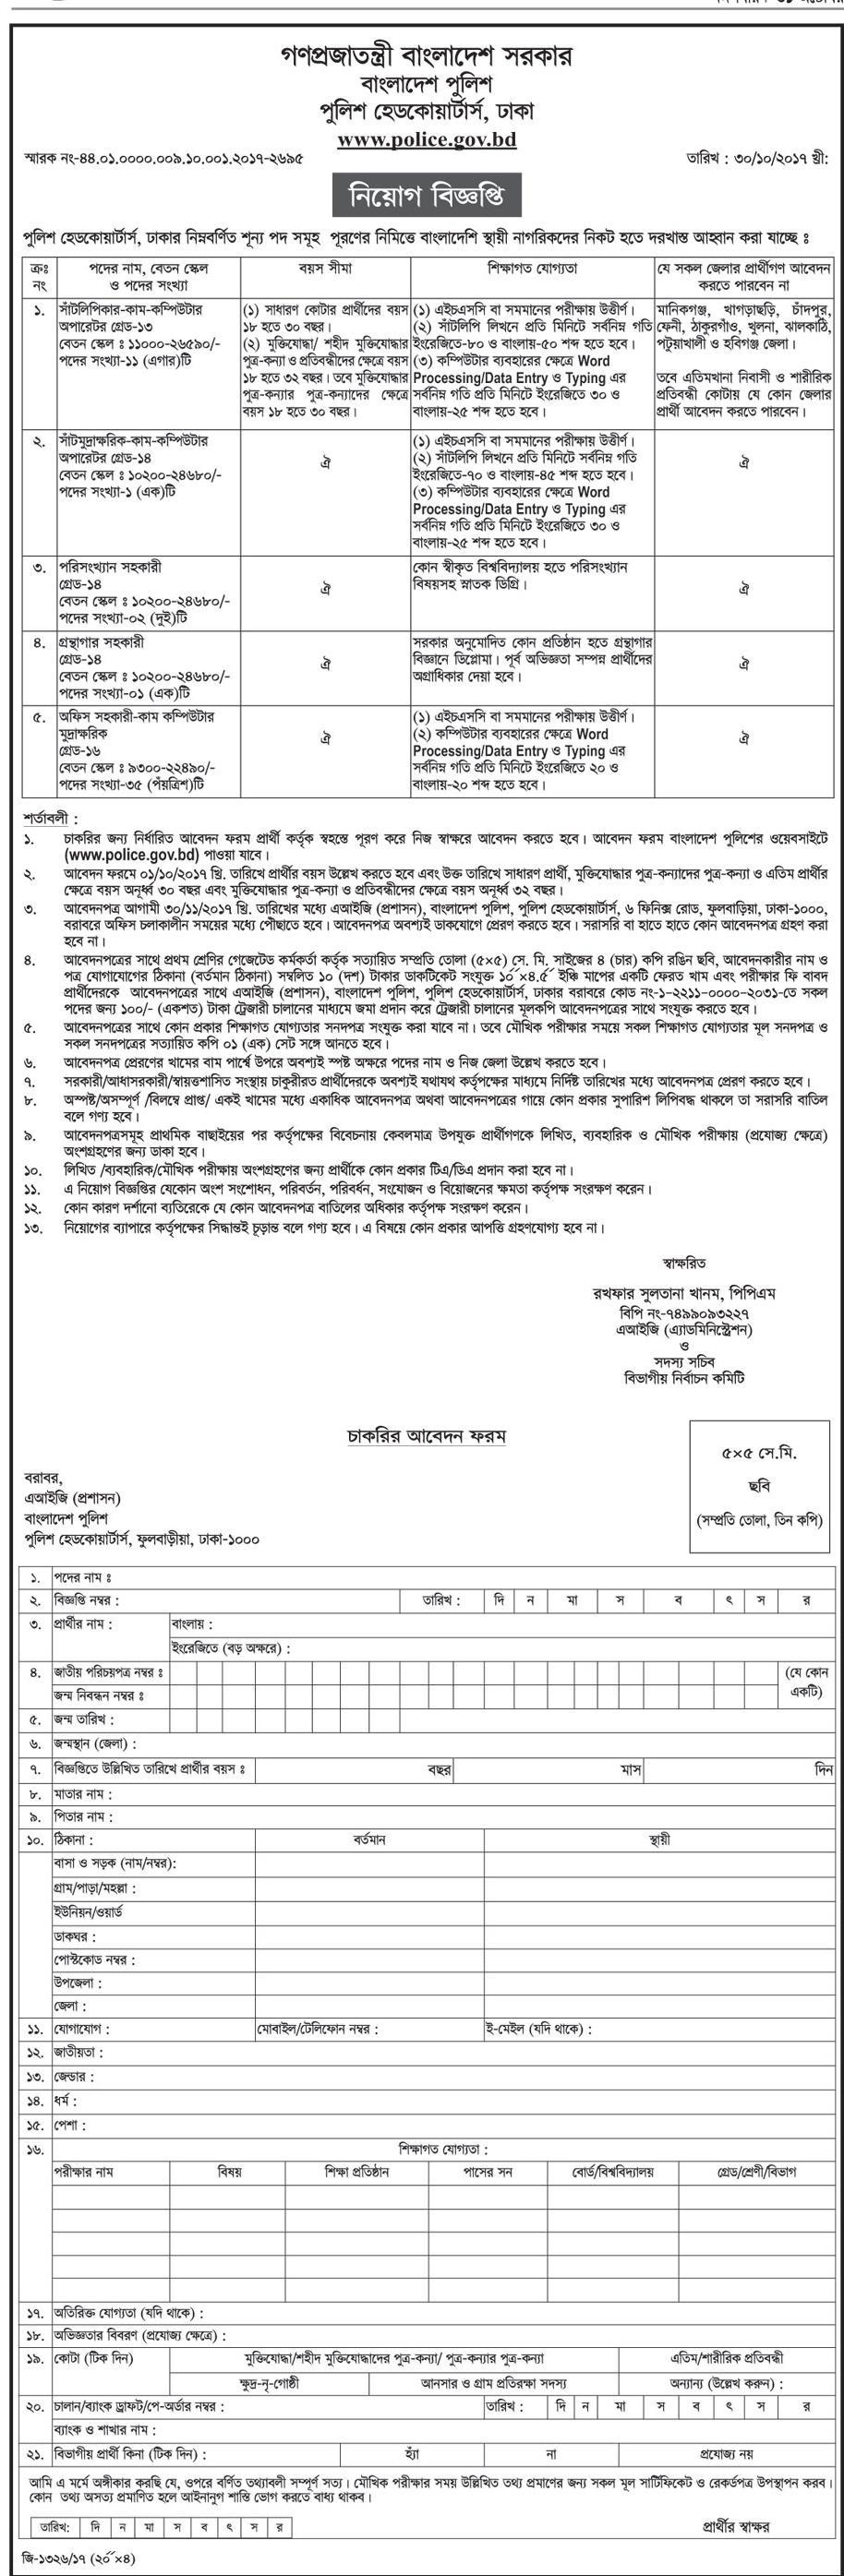 Bangladesh Police New Job Opportunity 2017